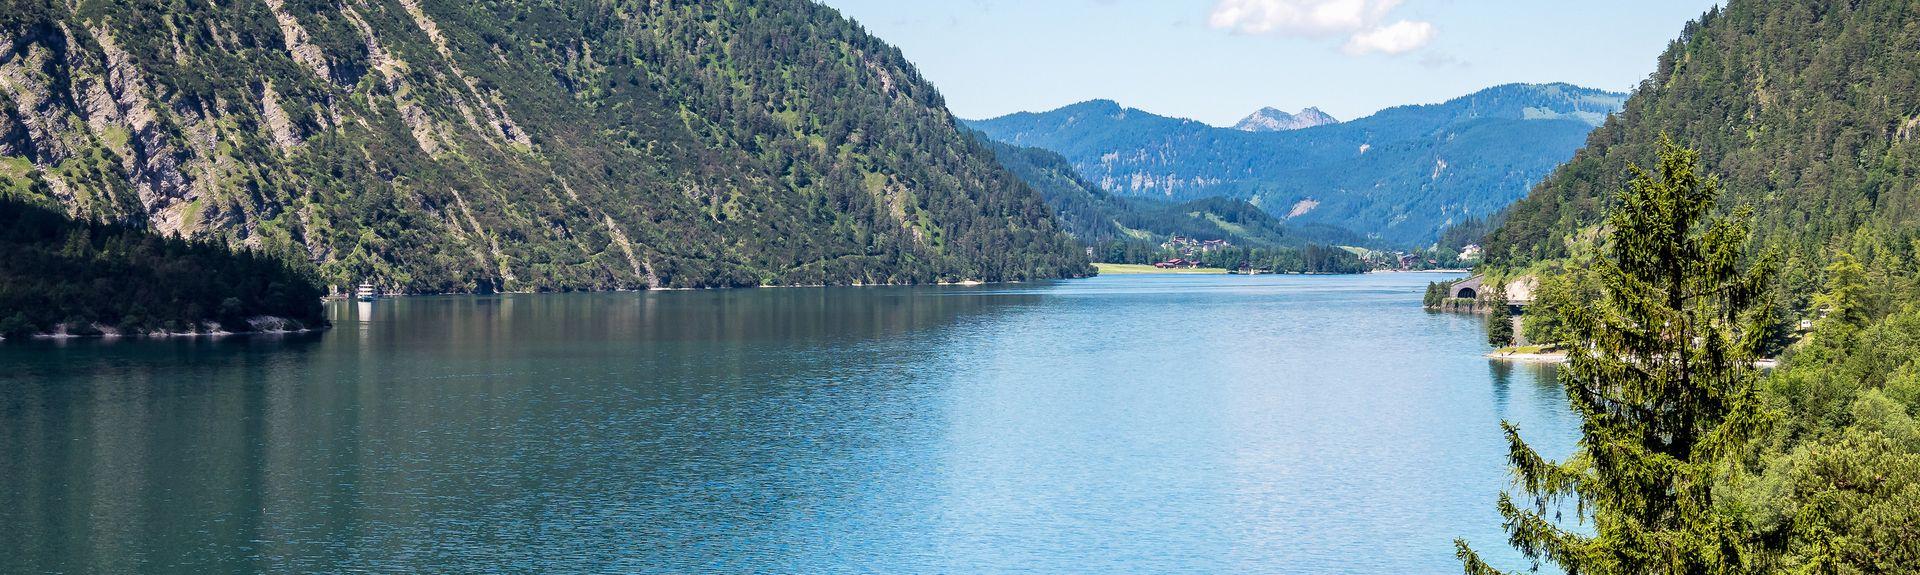 Achensee, Tirol, Oostenrijk